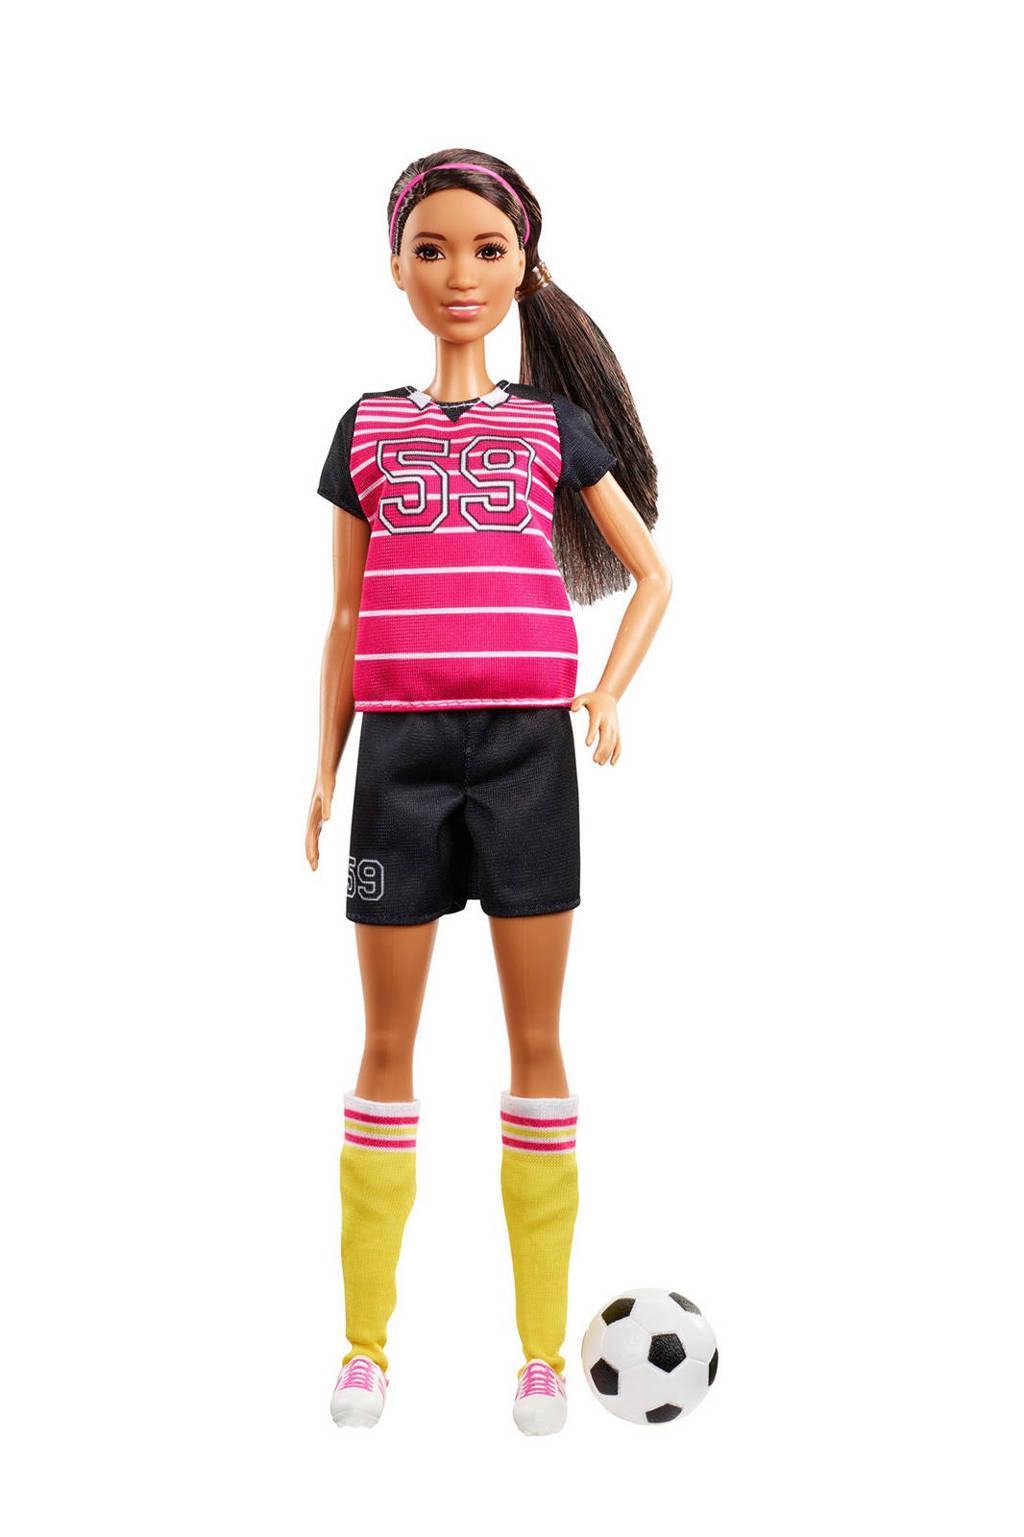 Barbie Carrièrepop atleet